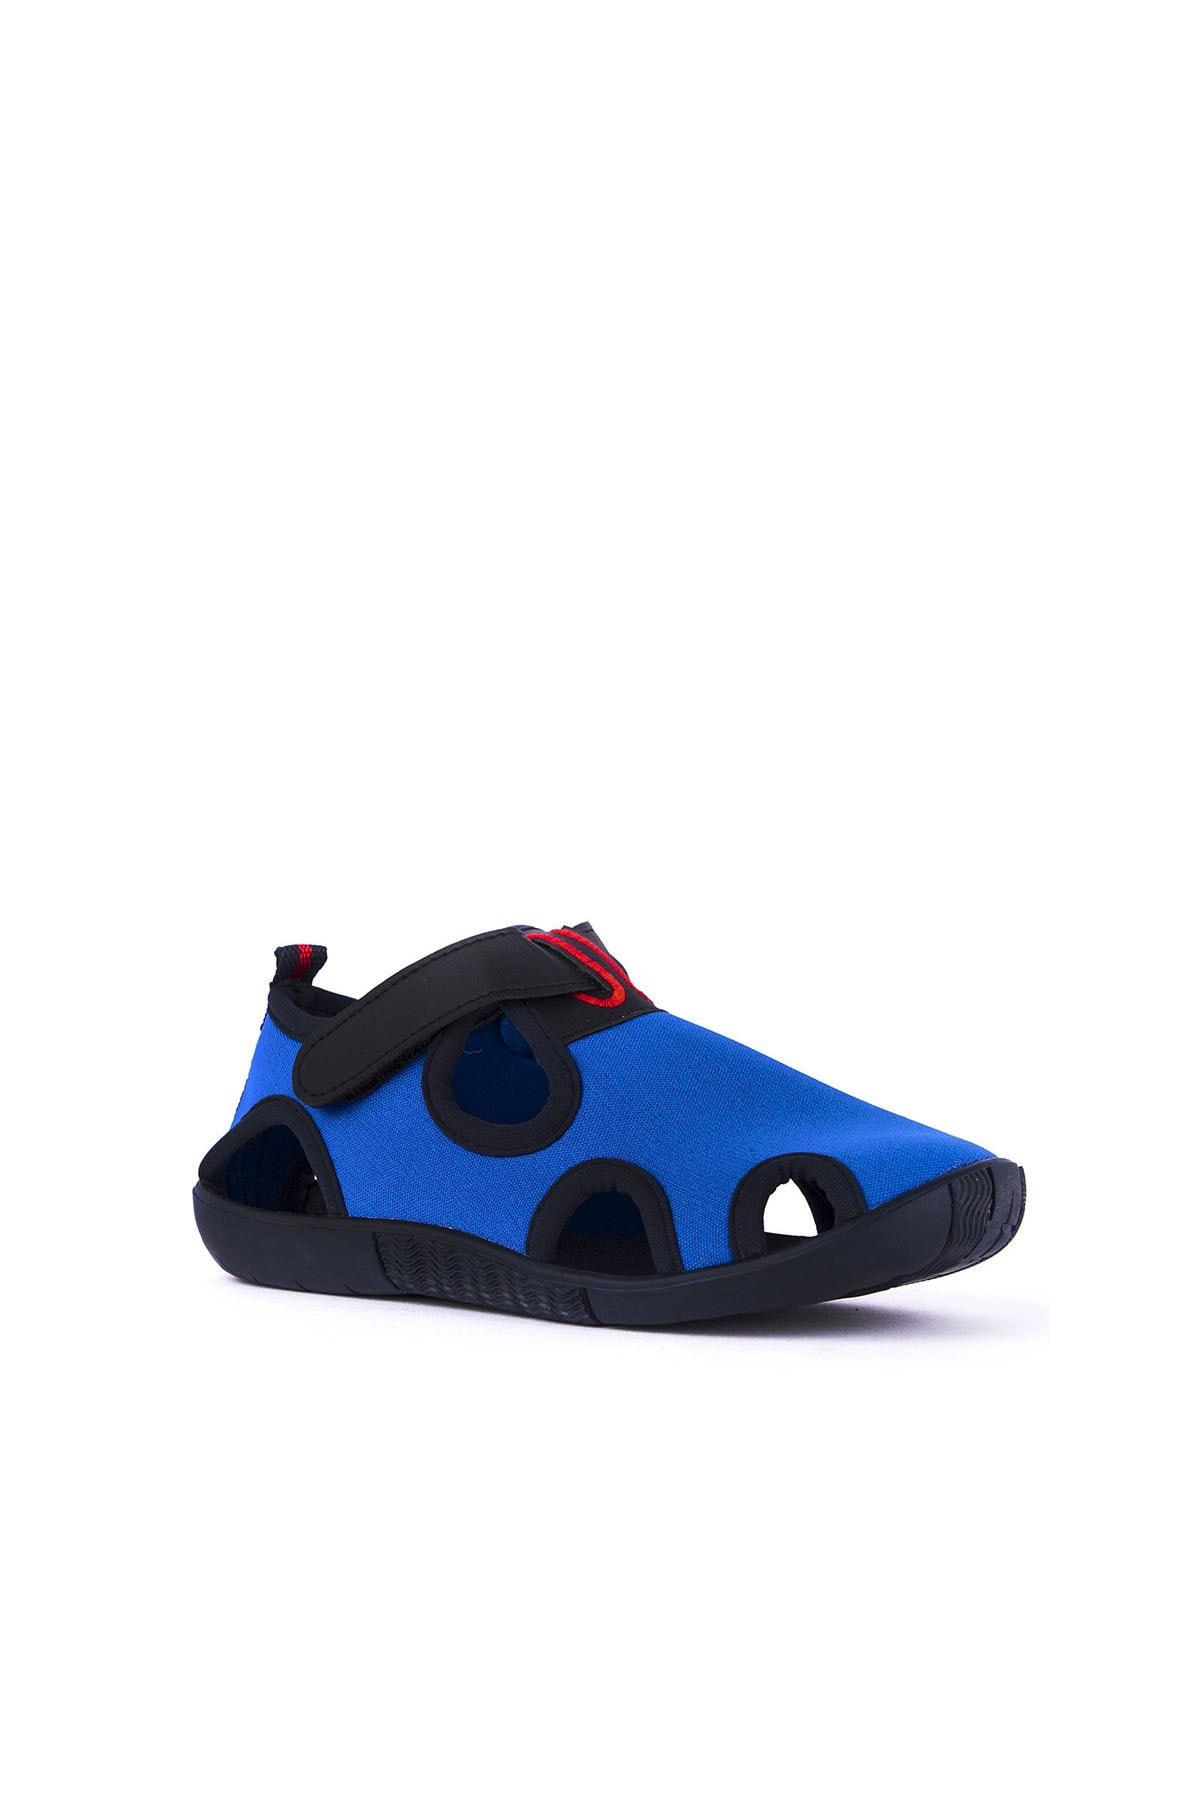 Slazenger UNNI Çocuk Sandalet Saks Mavi SA10LF054 2